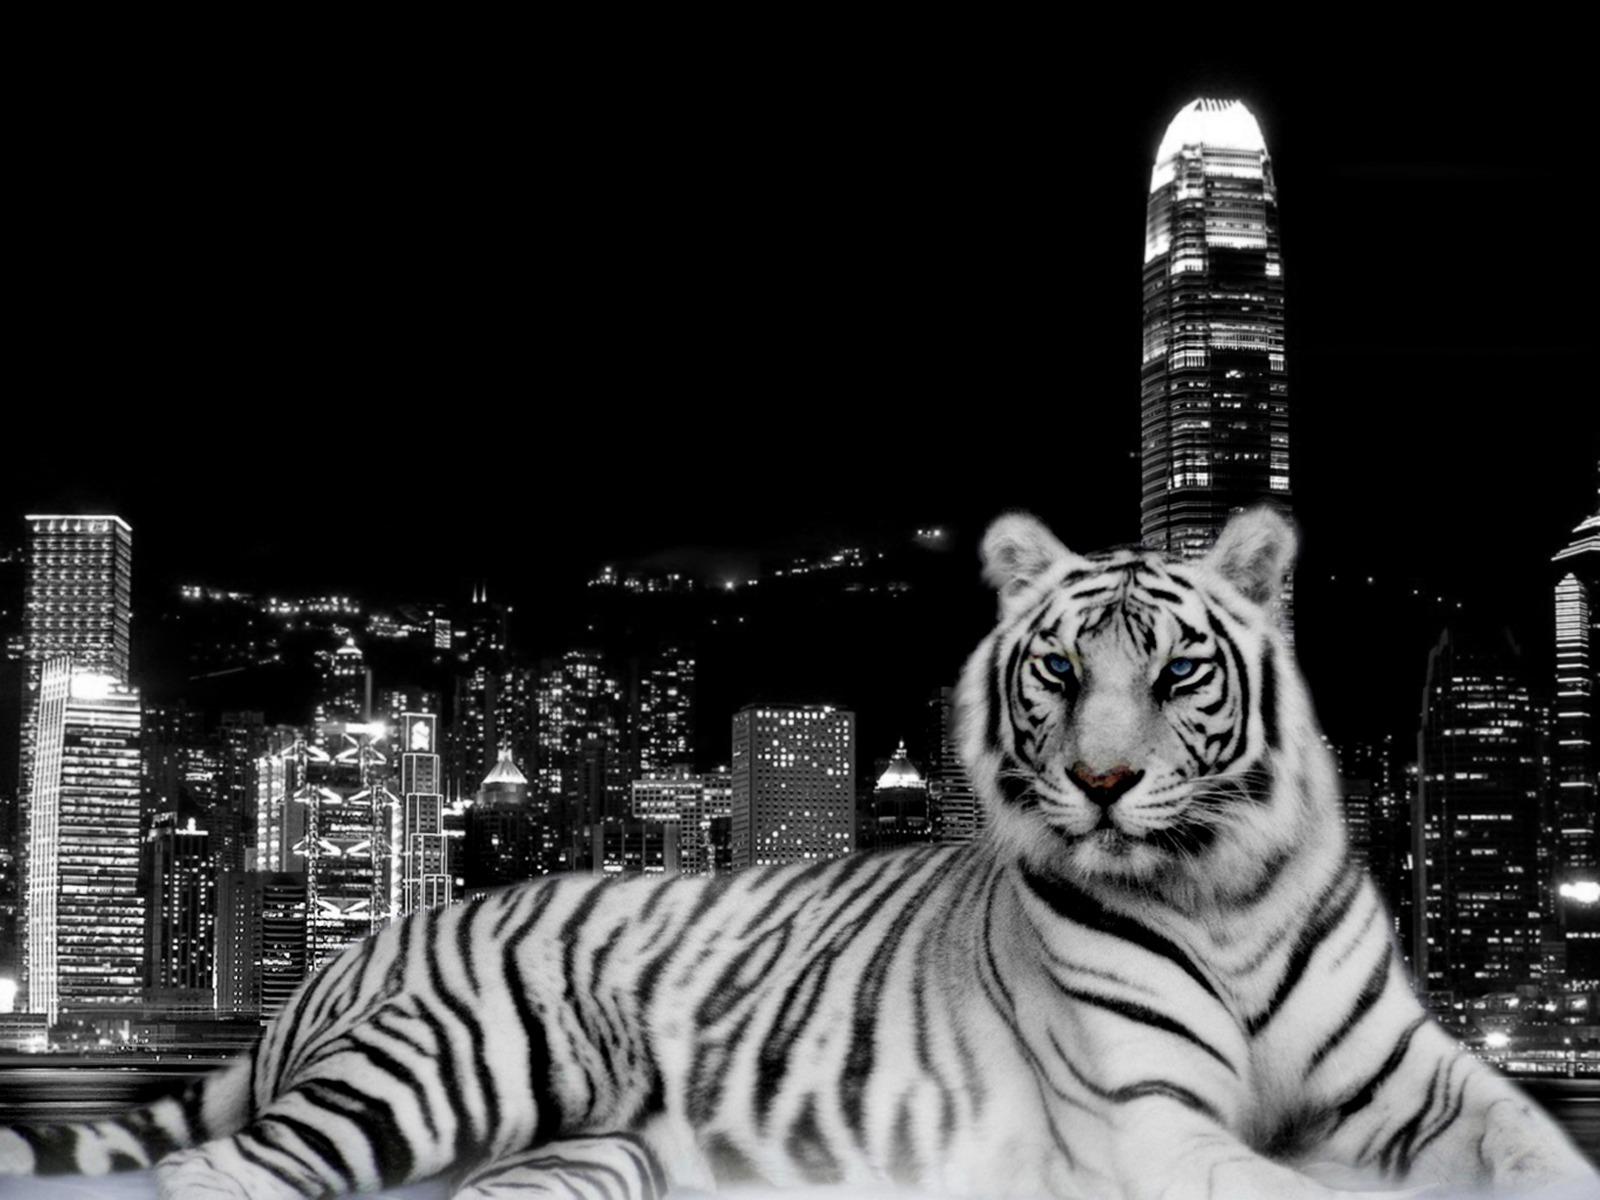 Tiger Wallpaper Black And White Hd